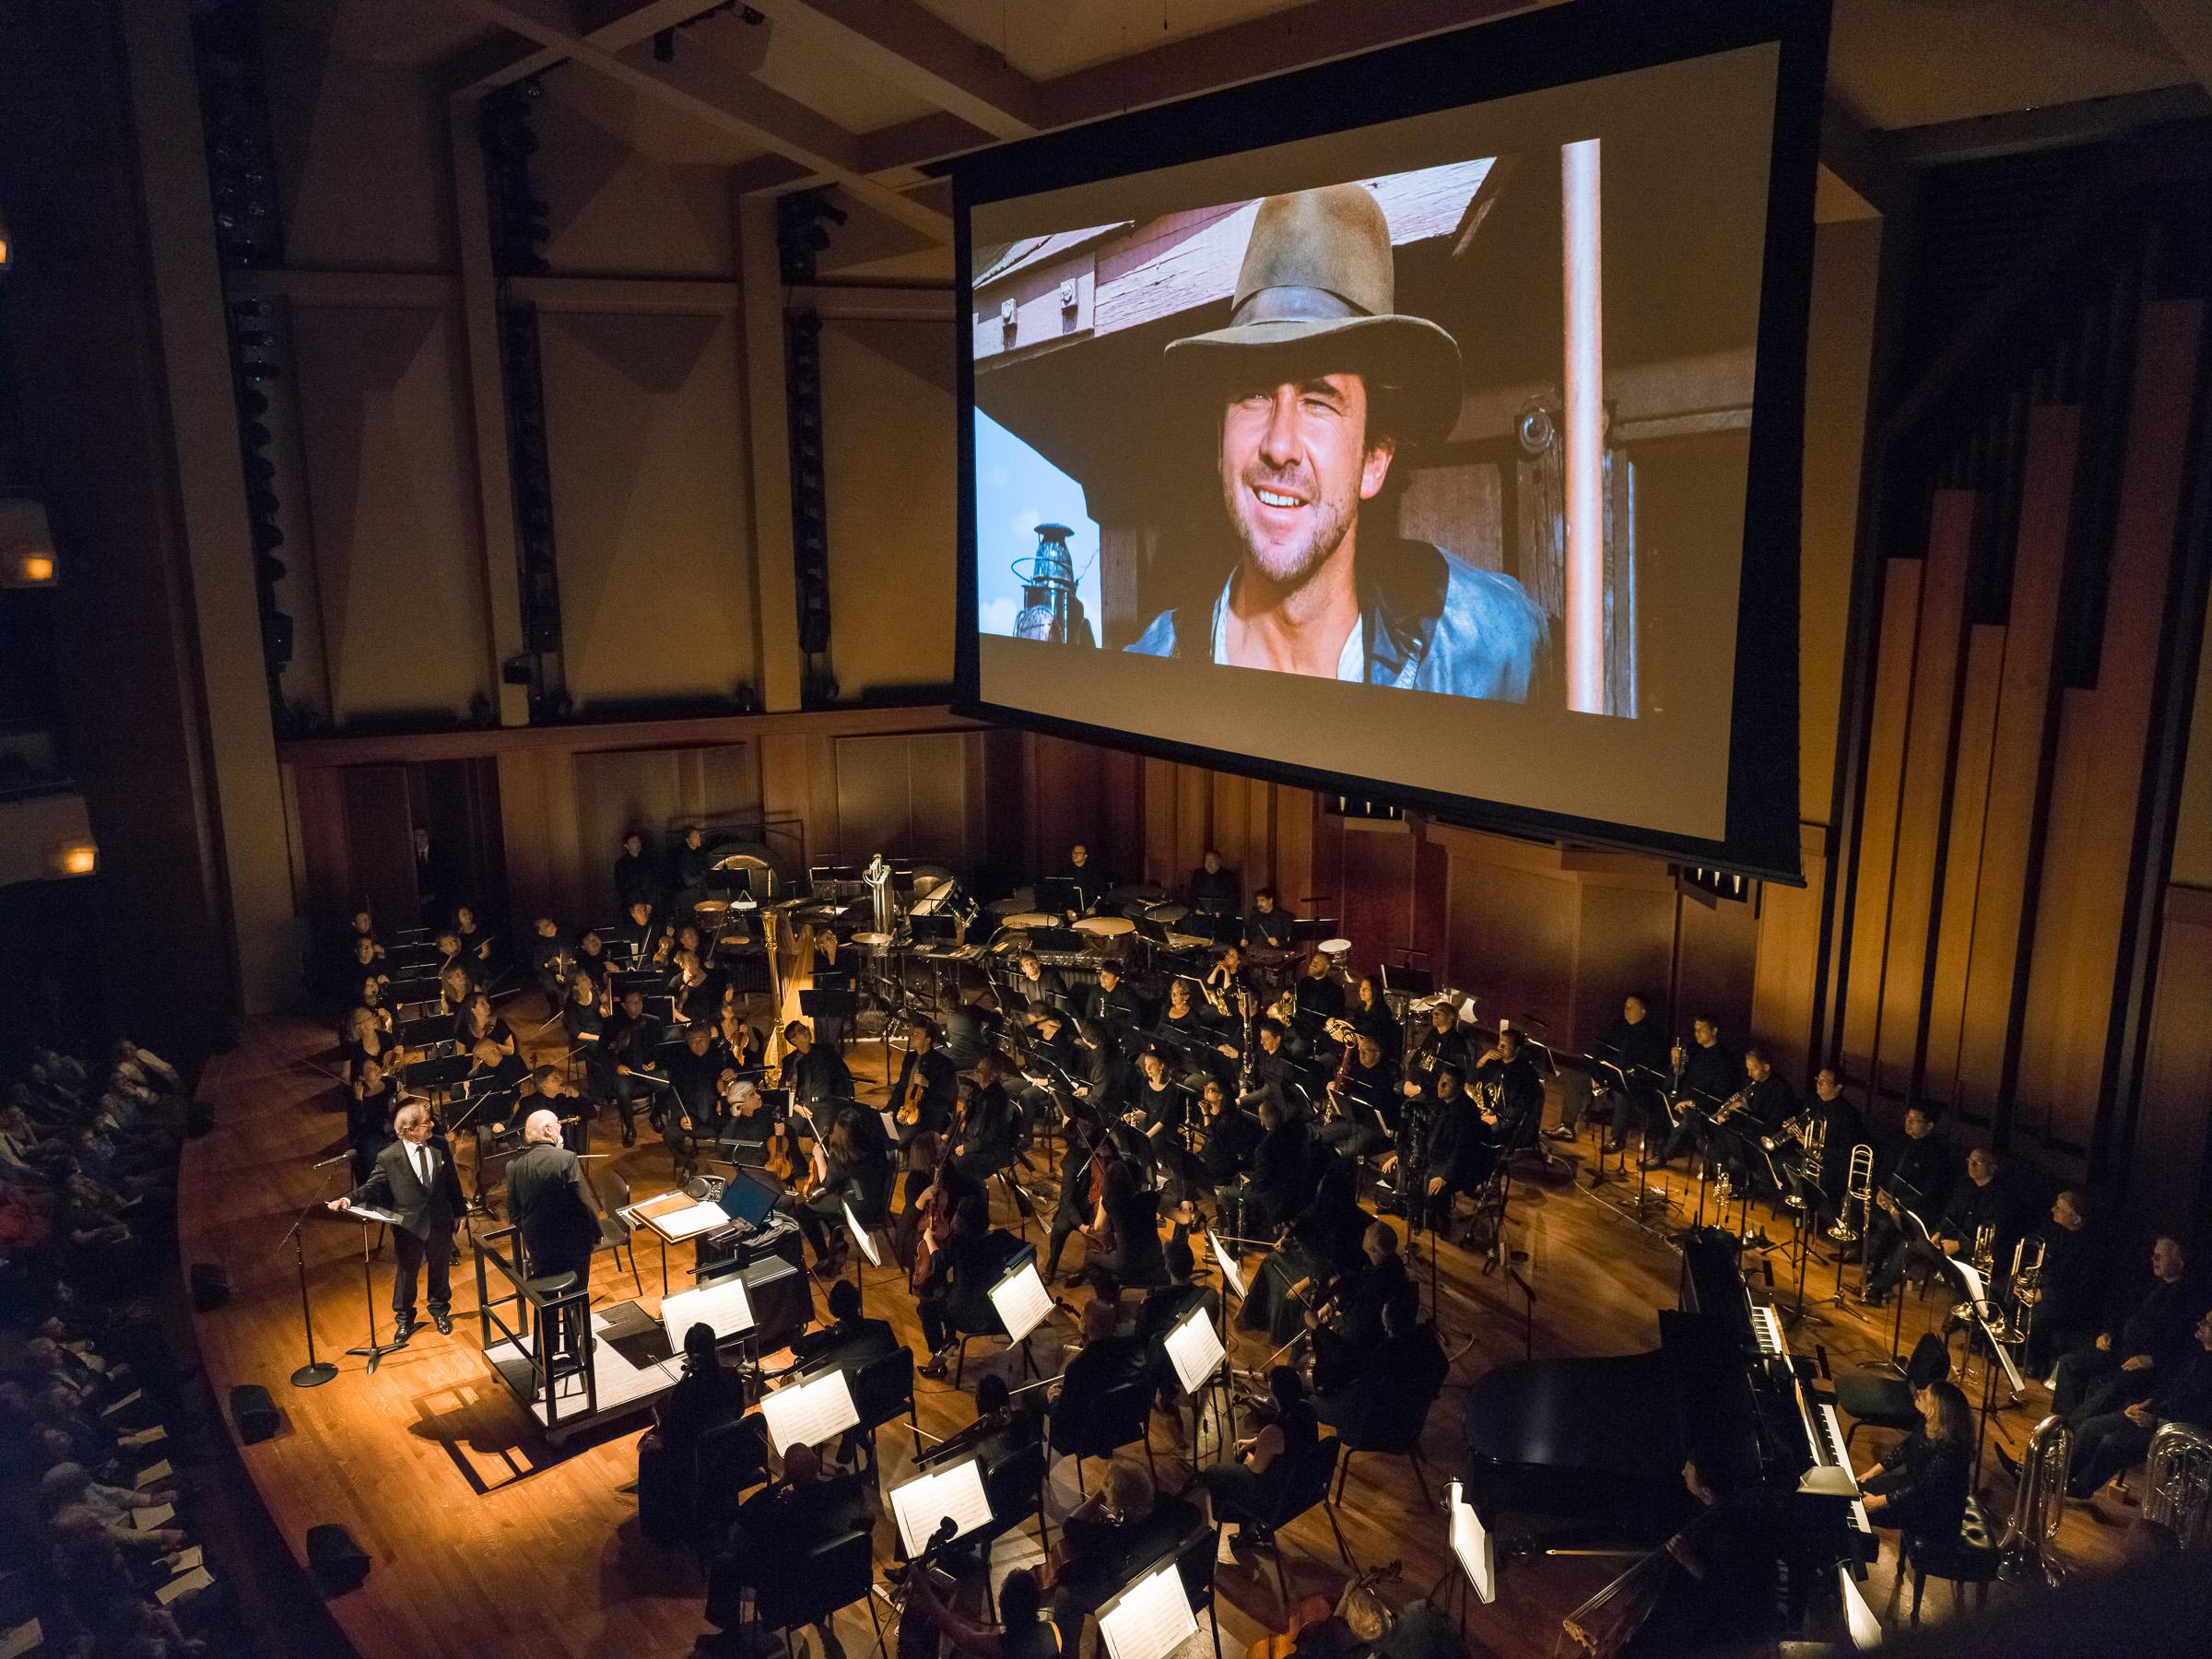 brandon_patoc_john_williams_Steven_Spielberg, Seattle_Symphony_Orchestra_Conert_0038.JPG